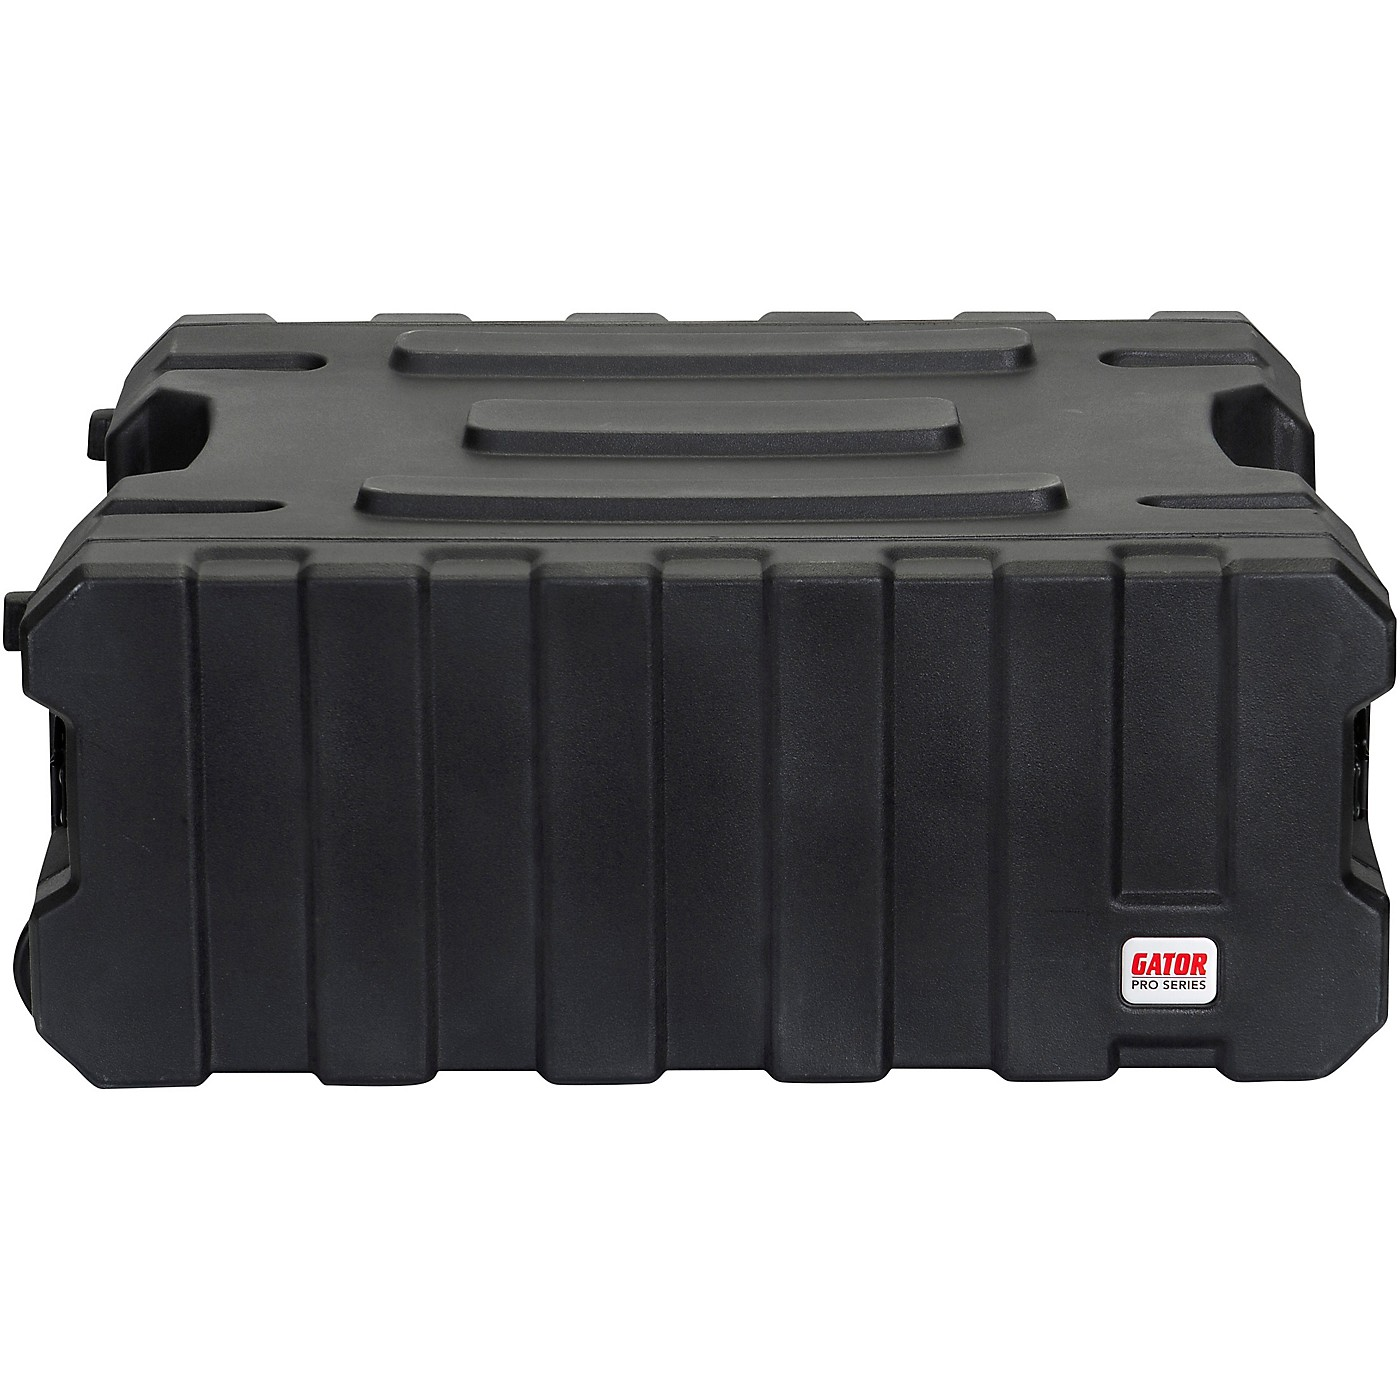 Gator G-Pro Roto Mold Rolling Rack Case thumbnail